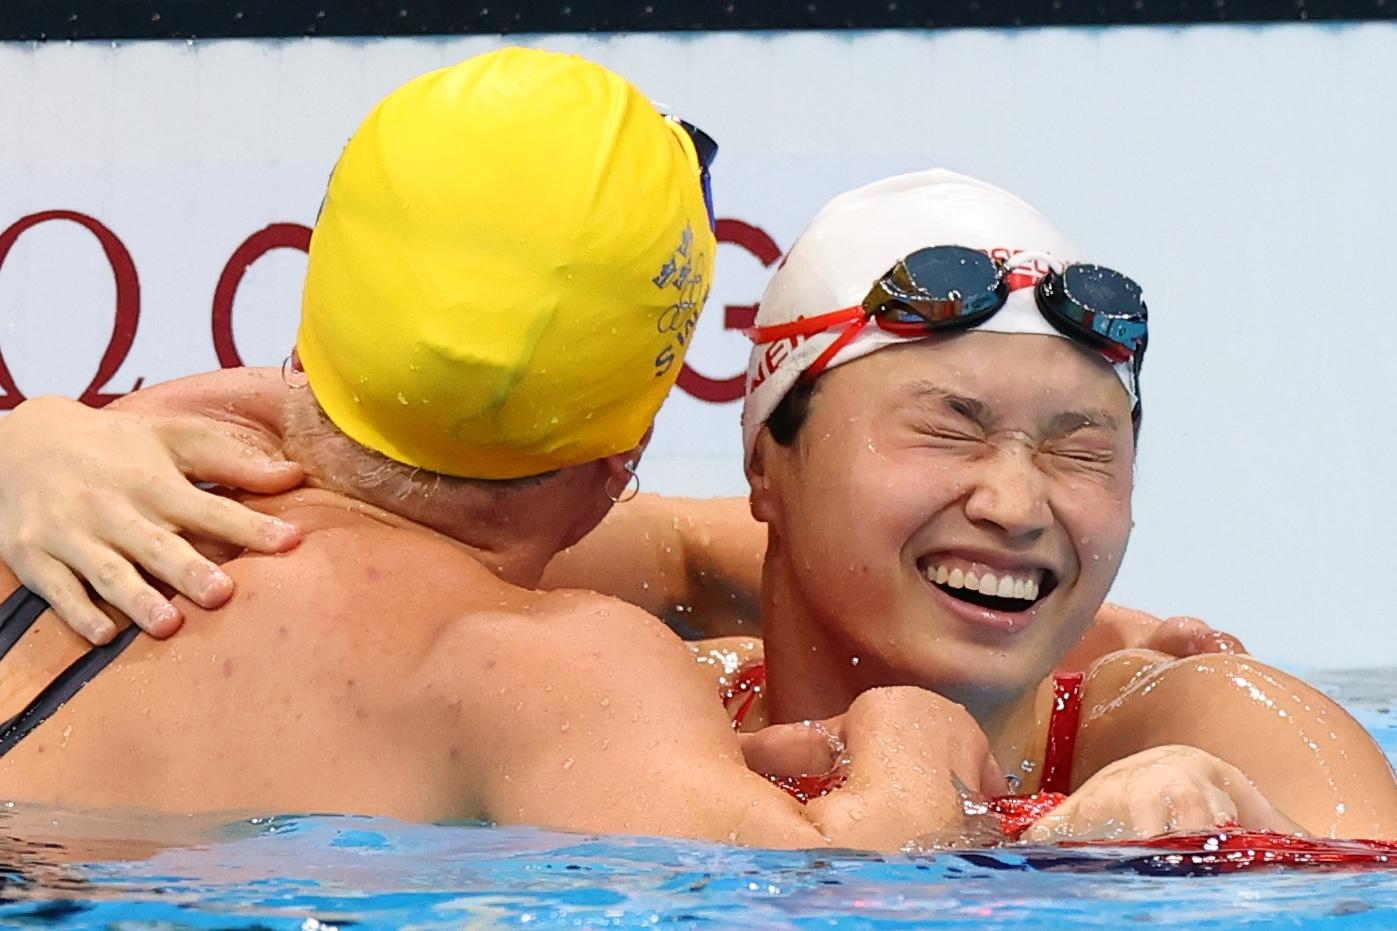 Tokyo 2020 Olympics - Swimming - Women's 100m Butterfly - Final - Tokyo Aquatics Centre - Tokyo, Japan - July 26, 2021. Margaret MacNeil of Canada celebrates after winning the gold medal. REUTERS/Marko Djurica - SP1EH7Q04TYI5